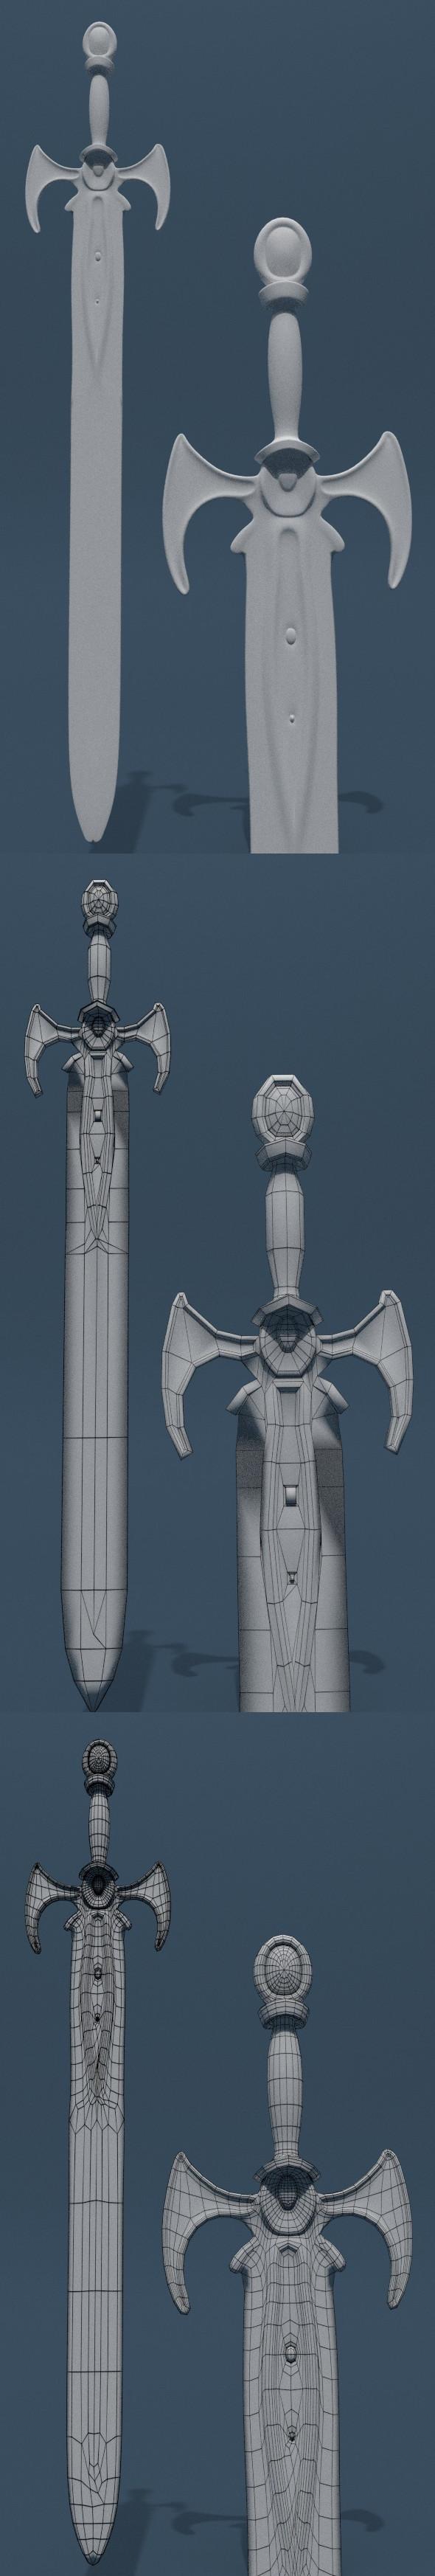 Sword Base Mesh (C)  - 3DOcean Item for Sale